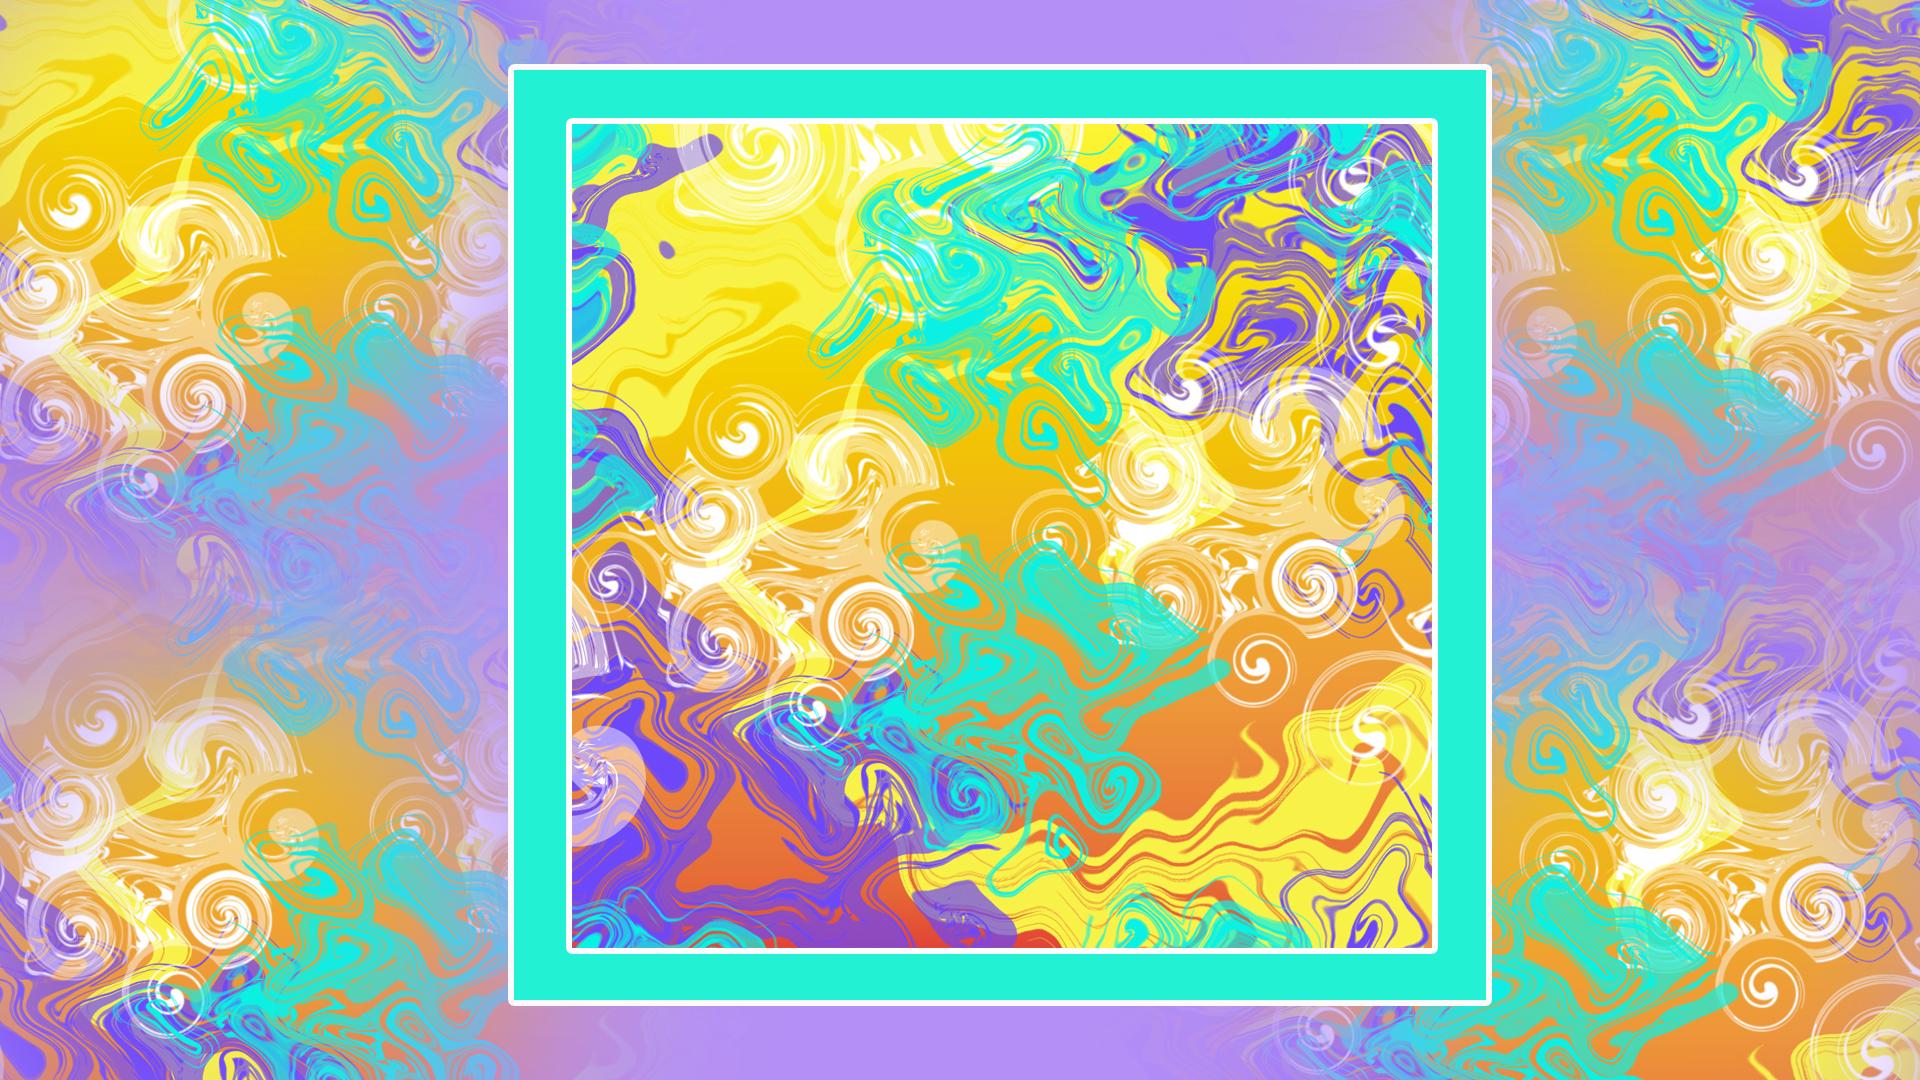 Artistic Colorful Digital Art Distortion Swirl 1920x1080